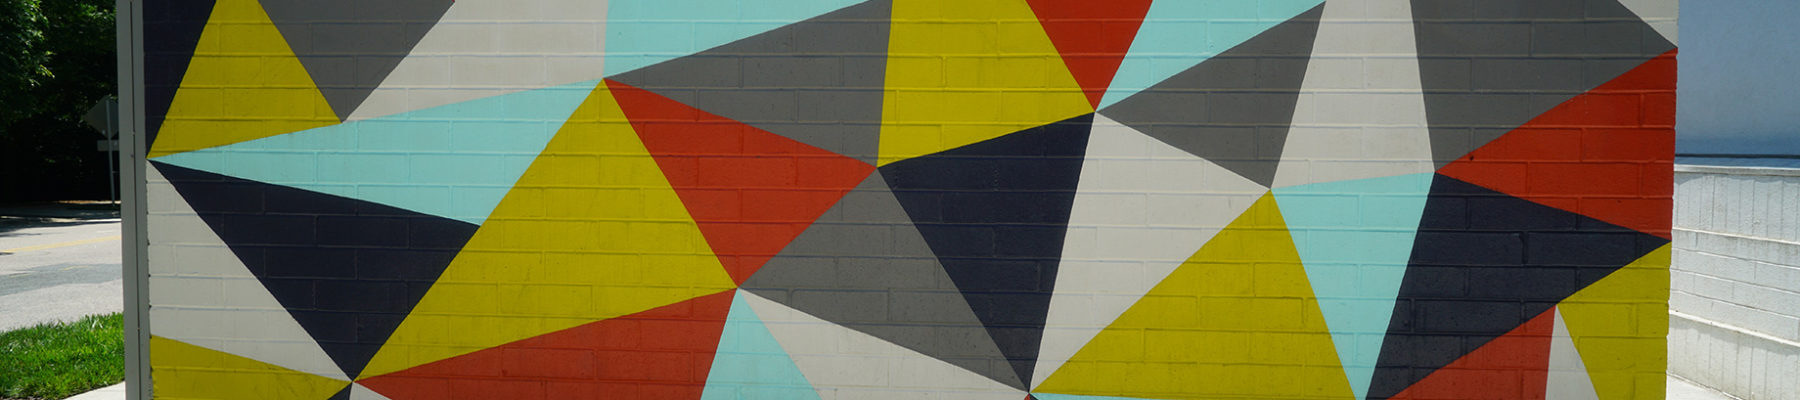 The Dartmouth Mural